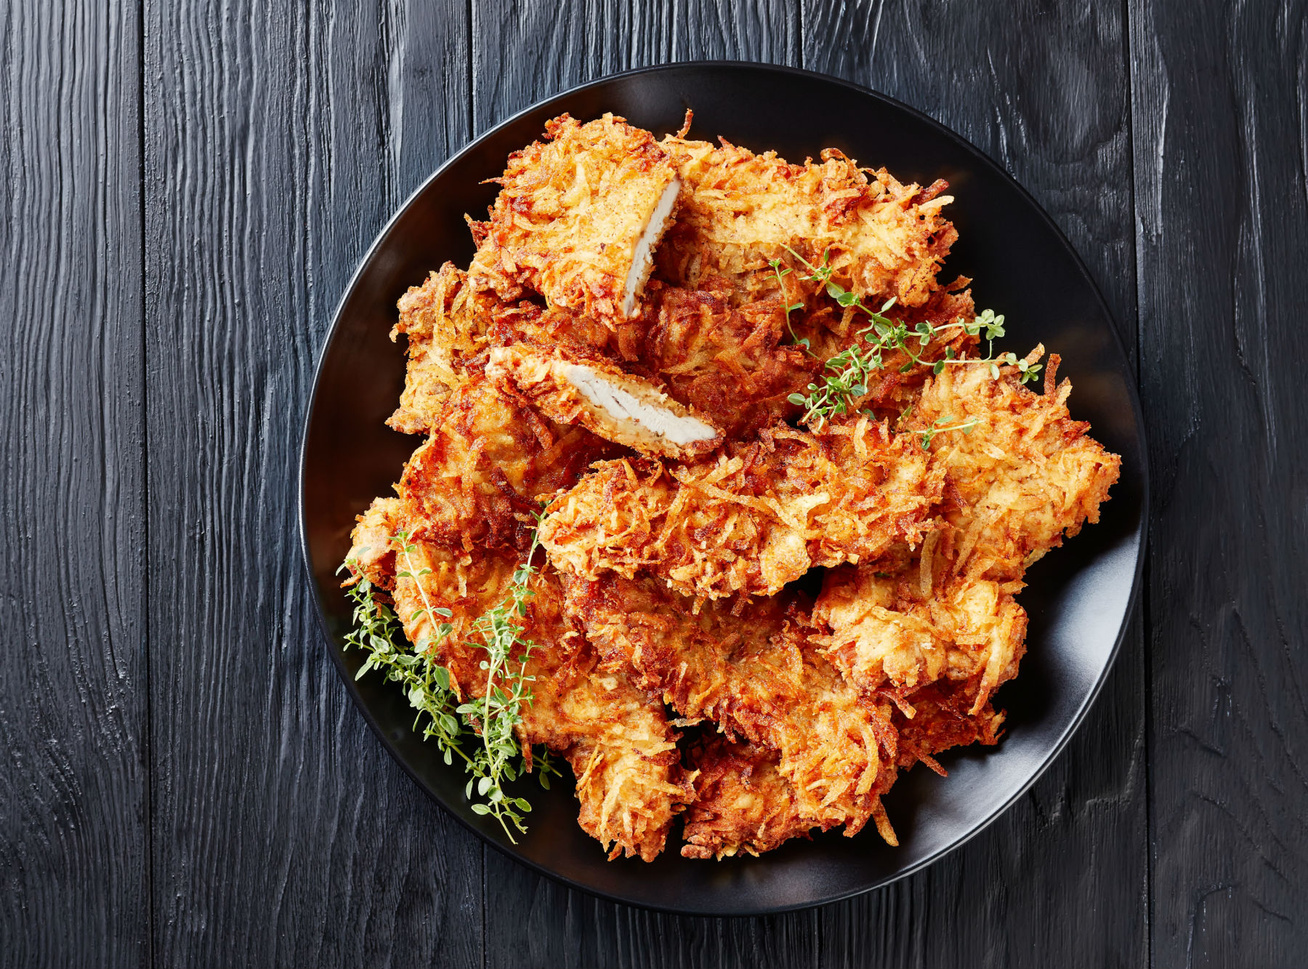 tejfolos-csirkemell-krumplibundaban